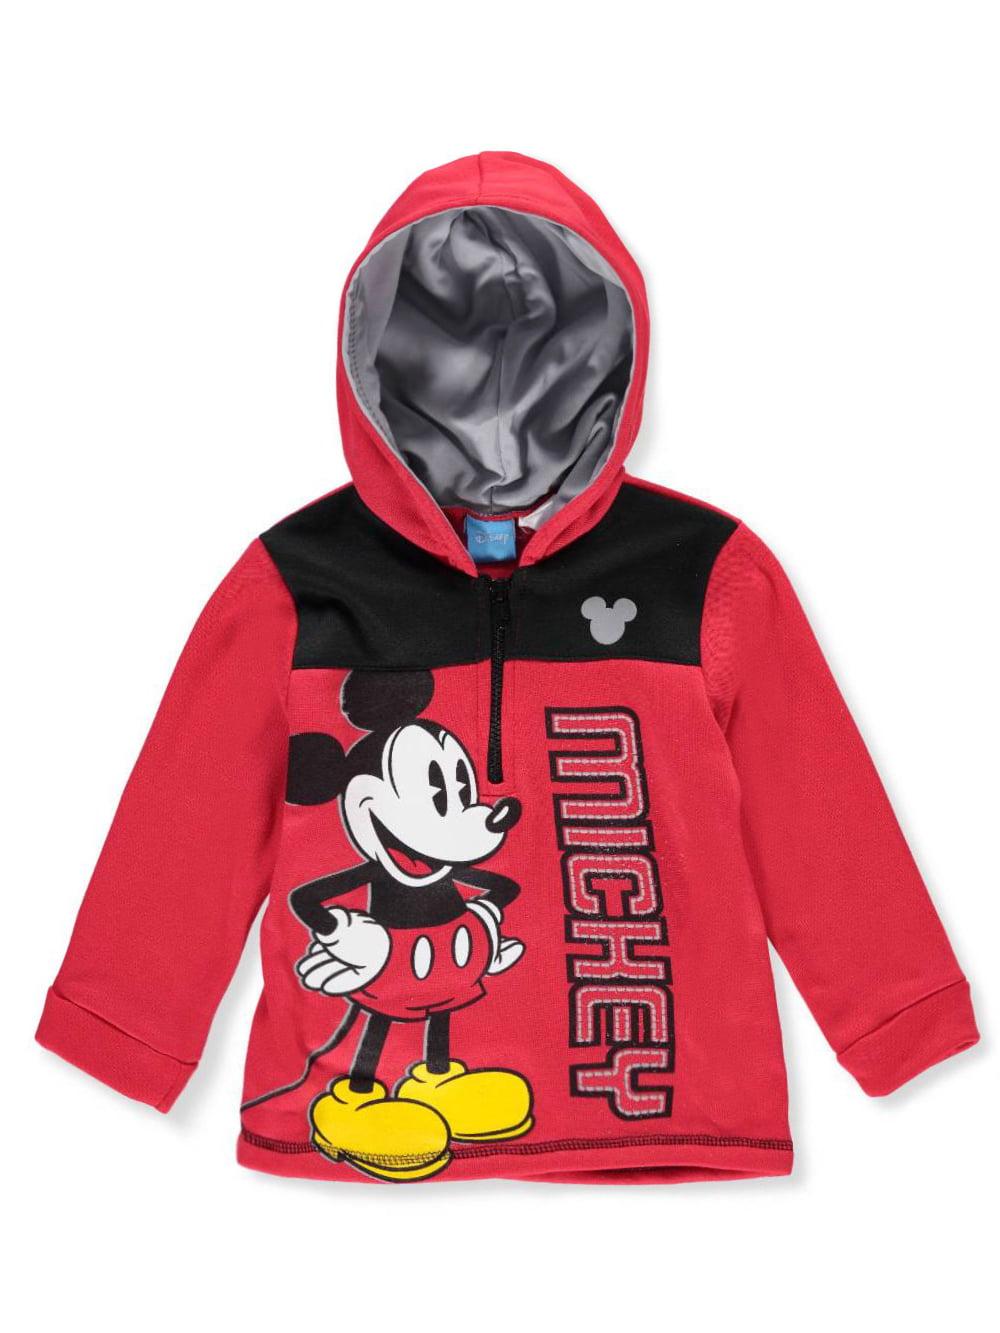 Mickey and the Roadster Racers Boys' Fleece Hoodie